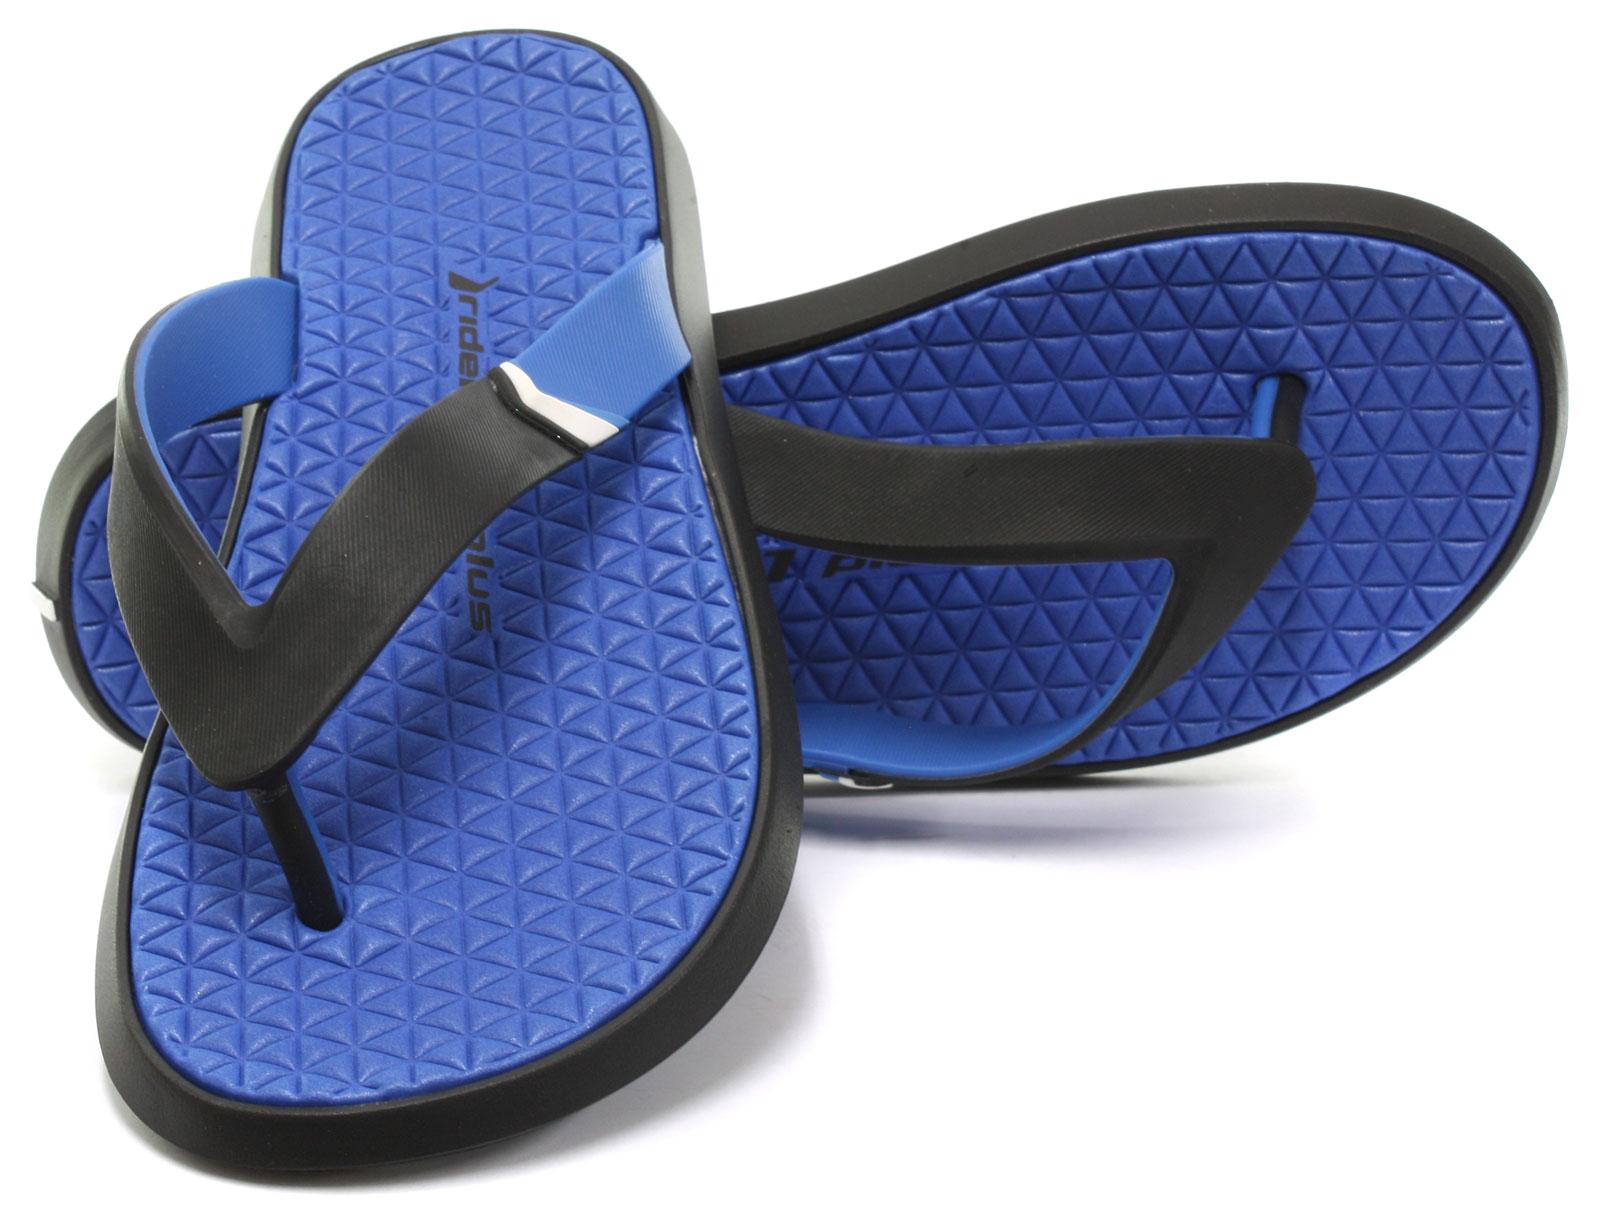 5c7aa43e4c1 reef convertible 3 sandals blue  rider brasil r1 plus black blue mens beach